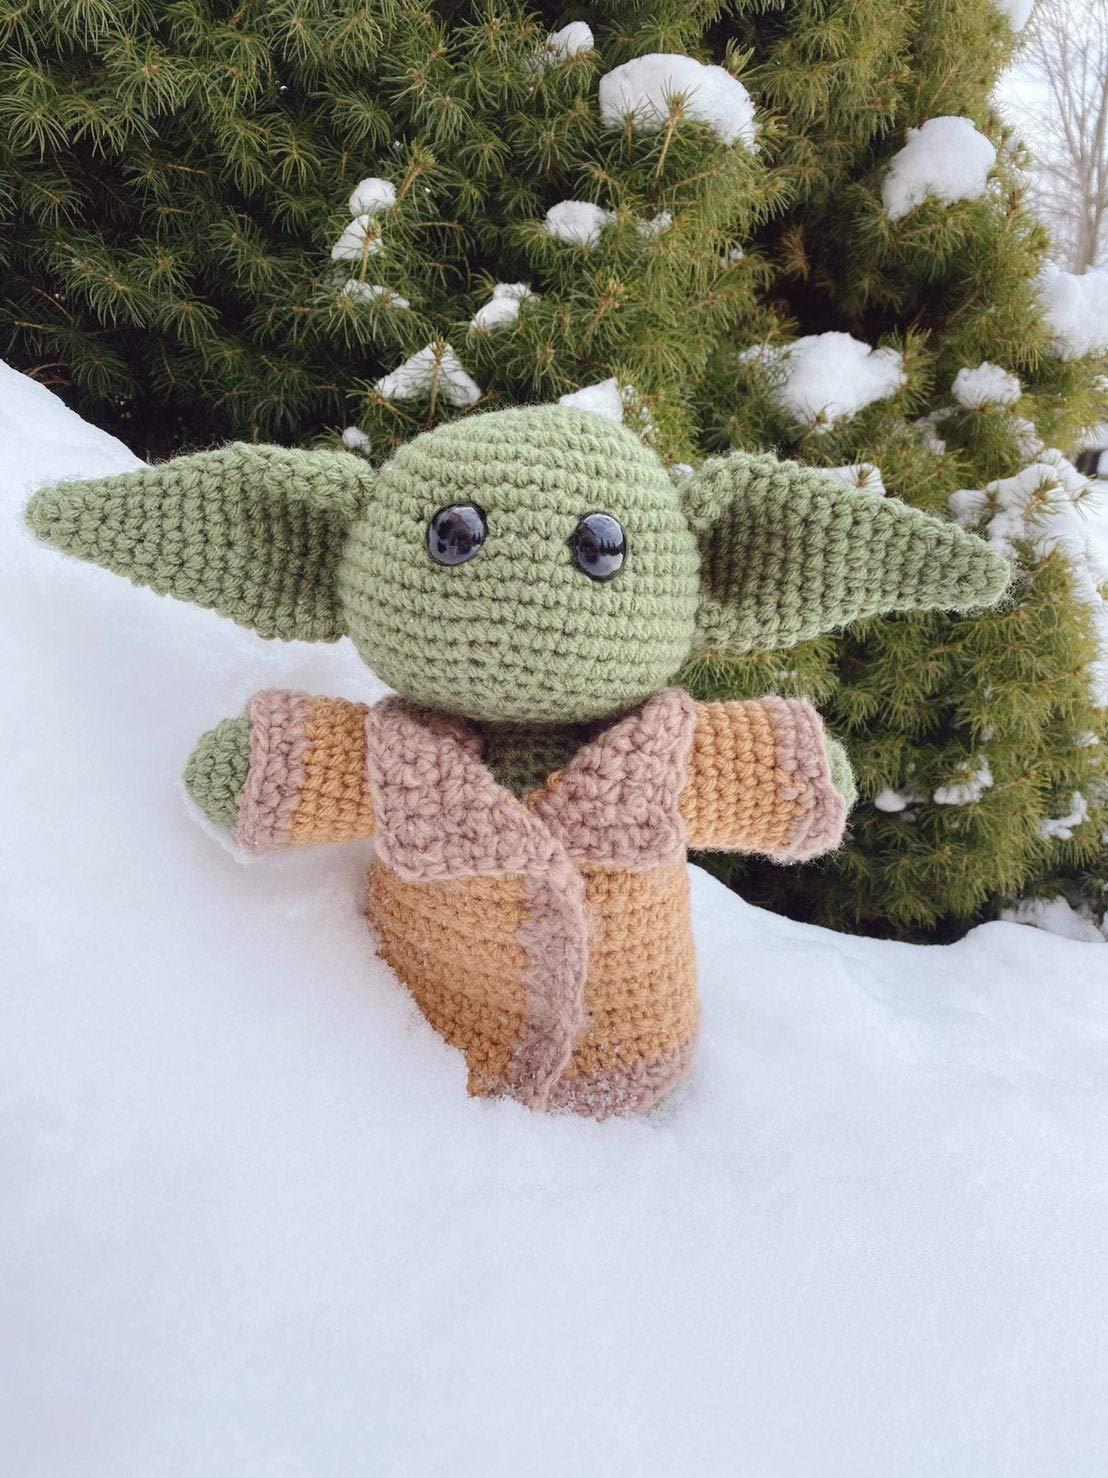 Crochet Baby Yoda Amigurumi Pattern - #Amigurumi; Star War #Yoda ... | 1478x1108